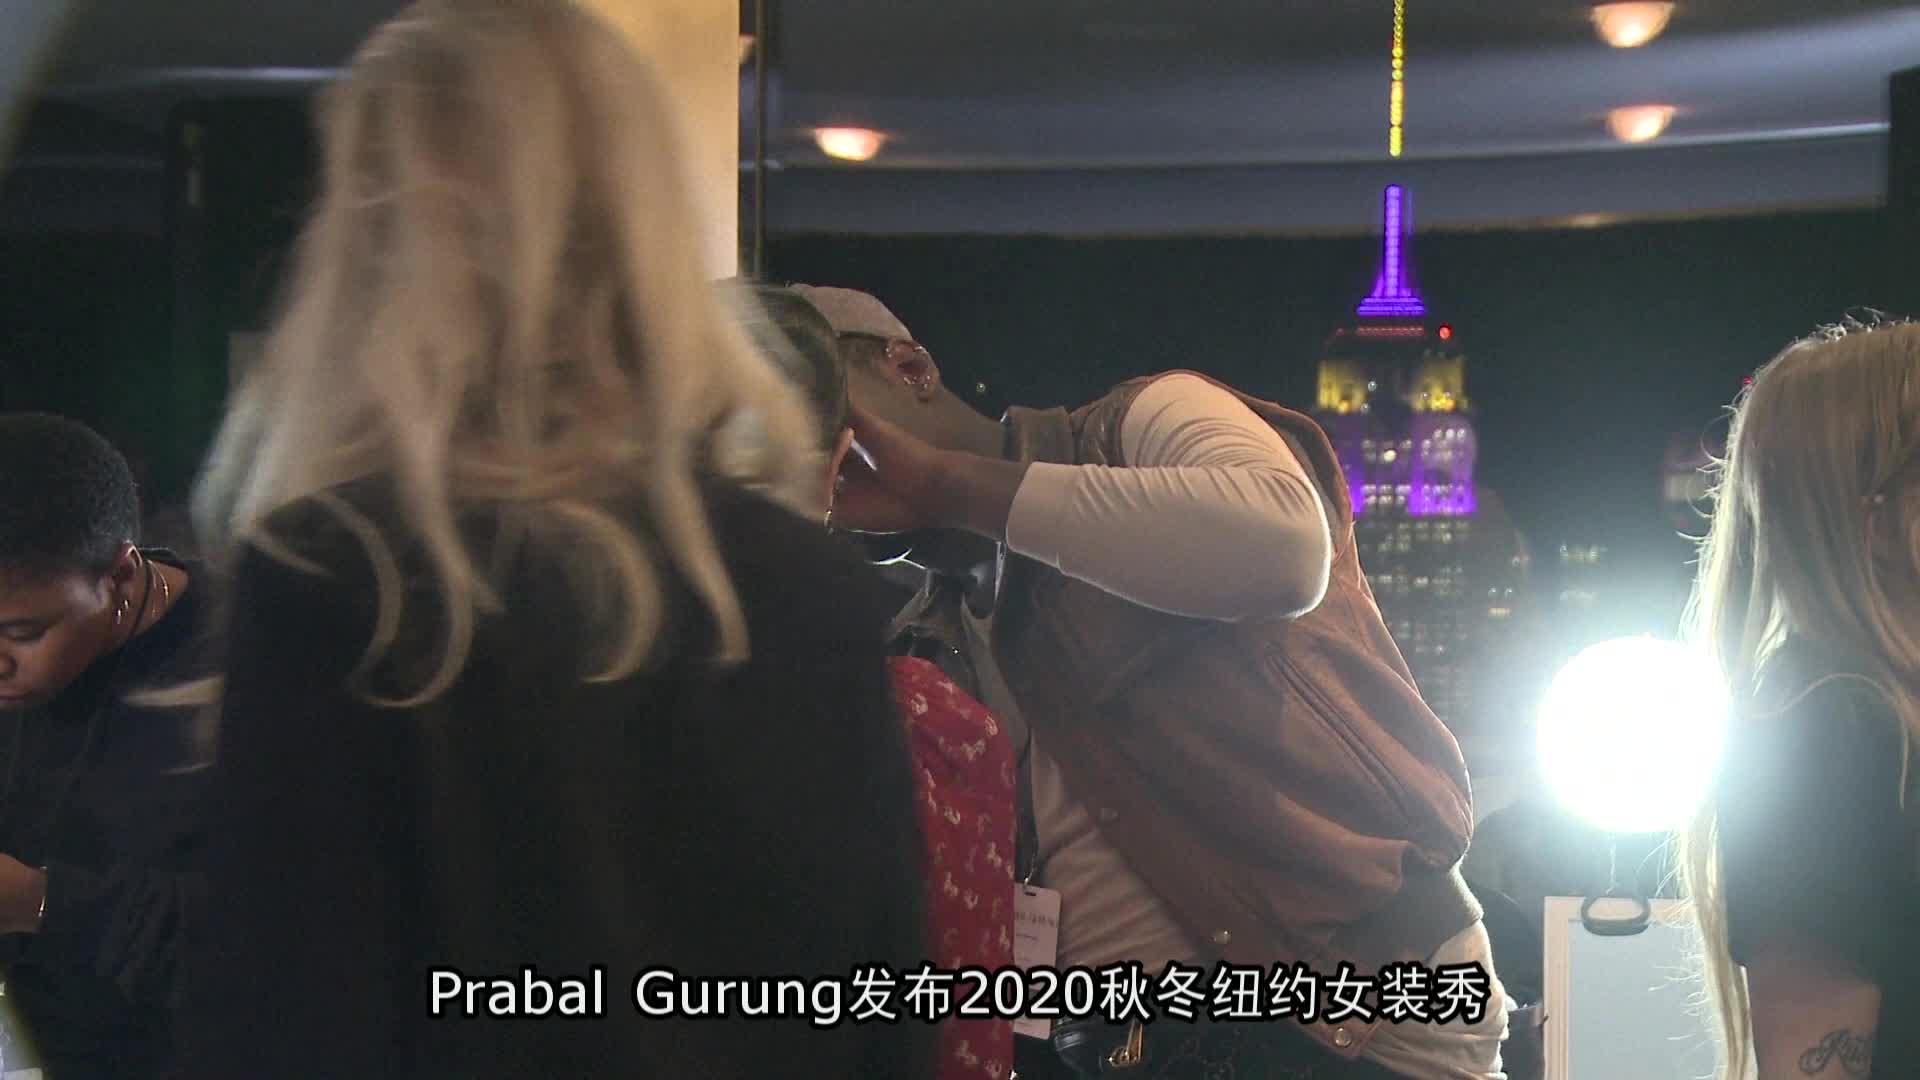 Prabal Gurung 2020秋冬纽约女装秀访谈